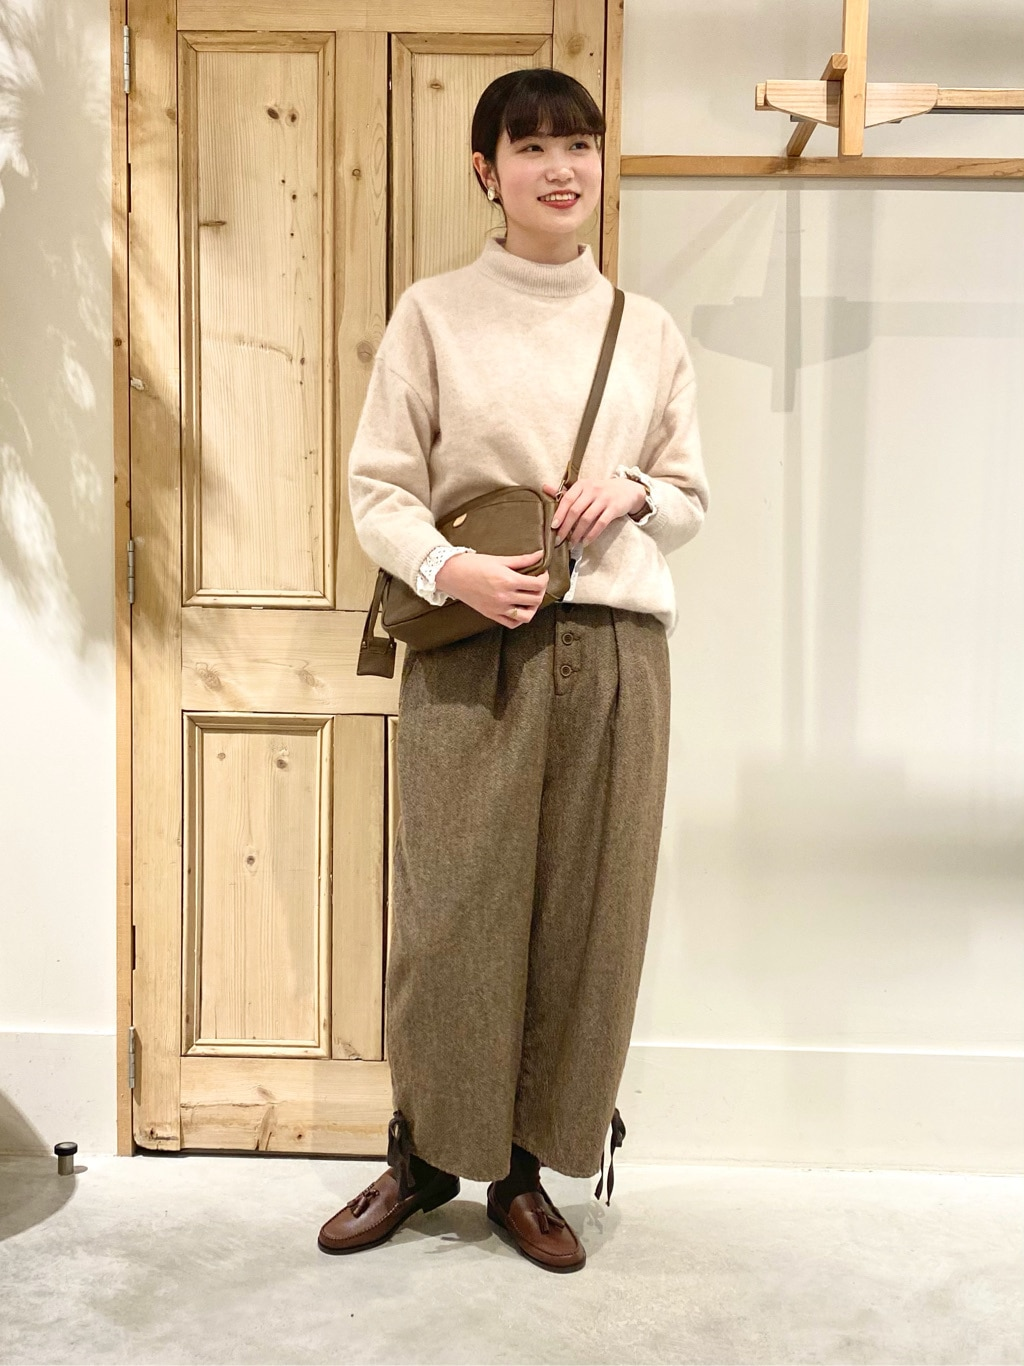 Malle chambre de charme 調布パルコ 身長:167cm 2020.12.15